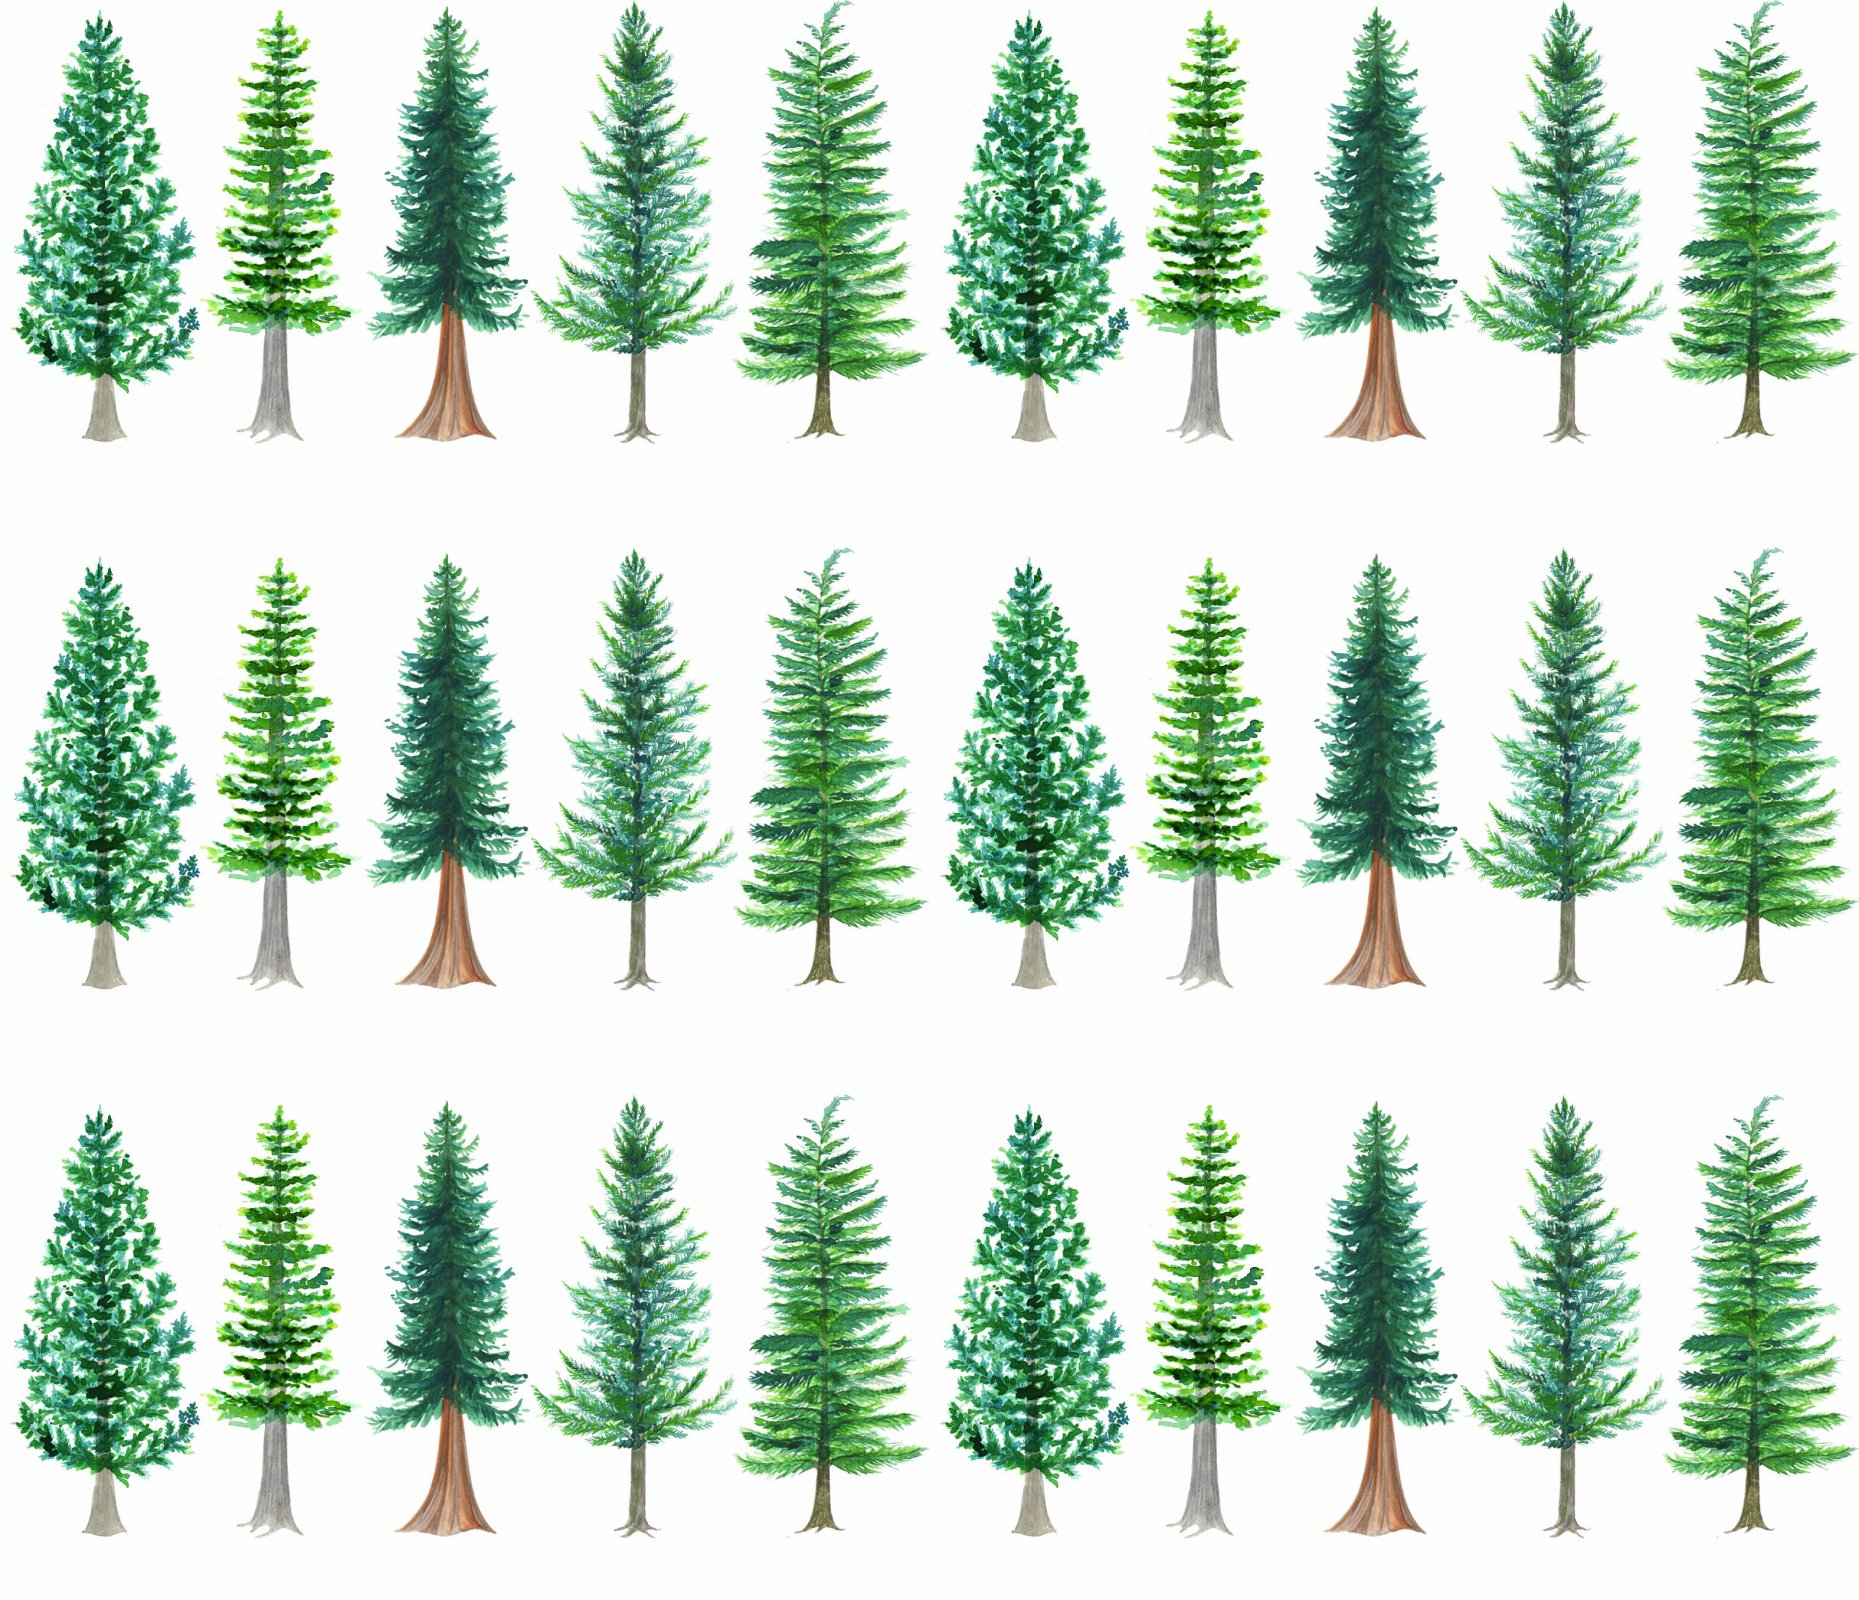 WWQSH 2021 Treepattern PRE-ORDER